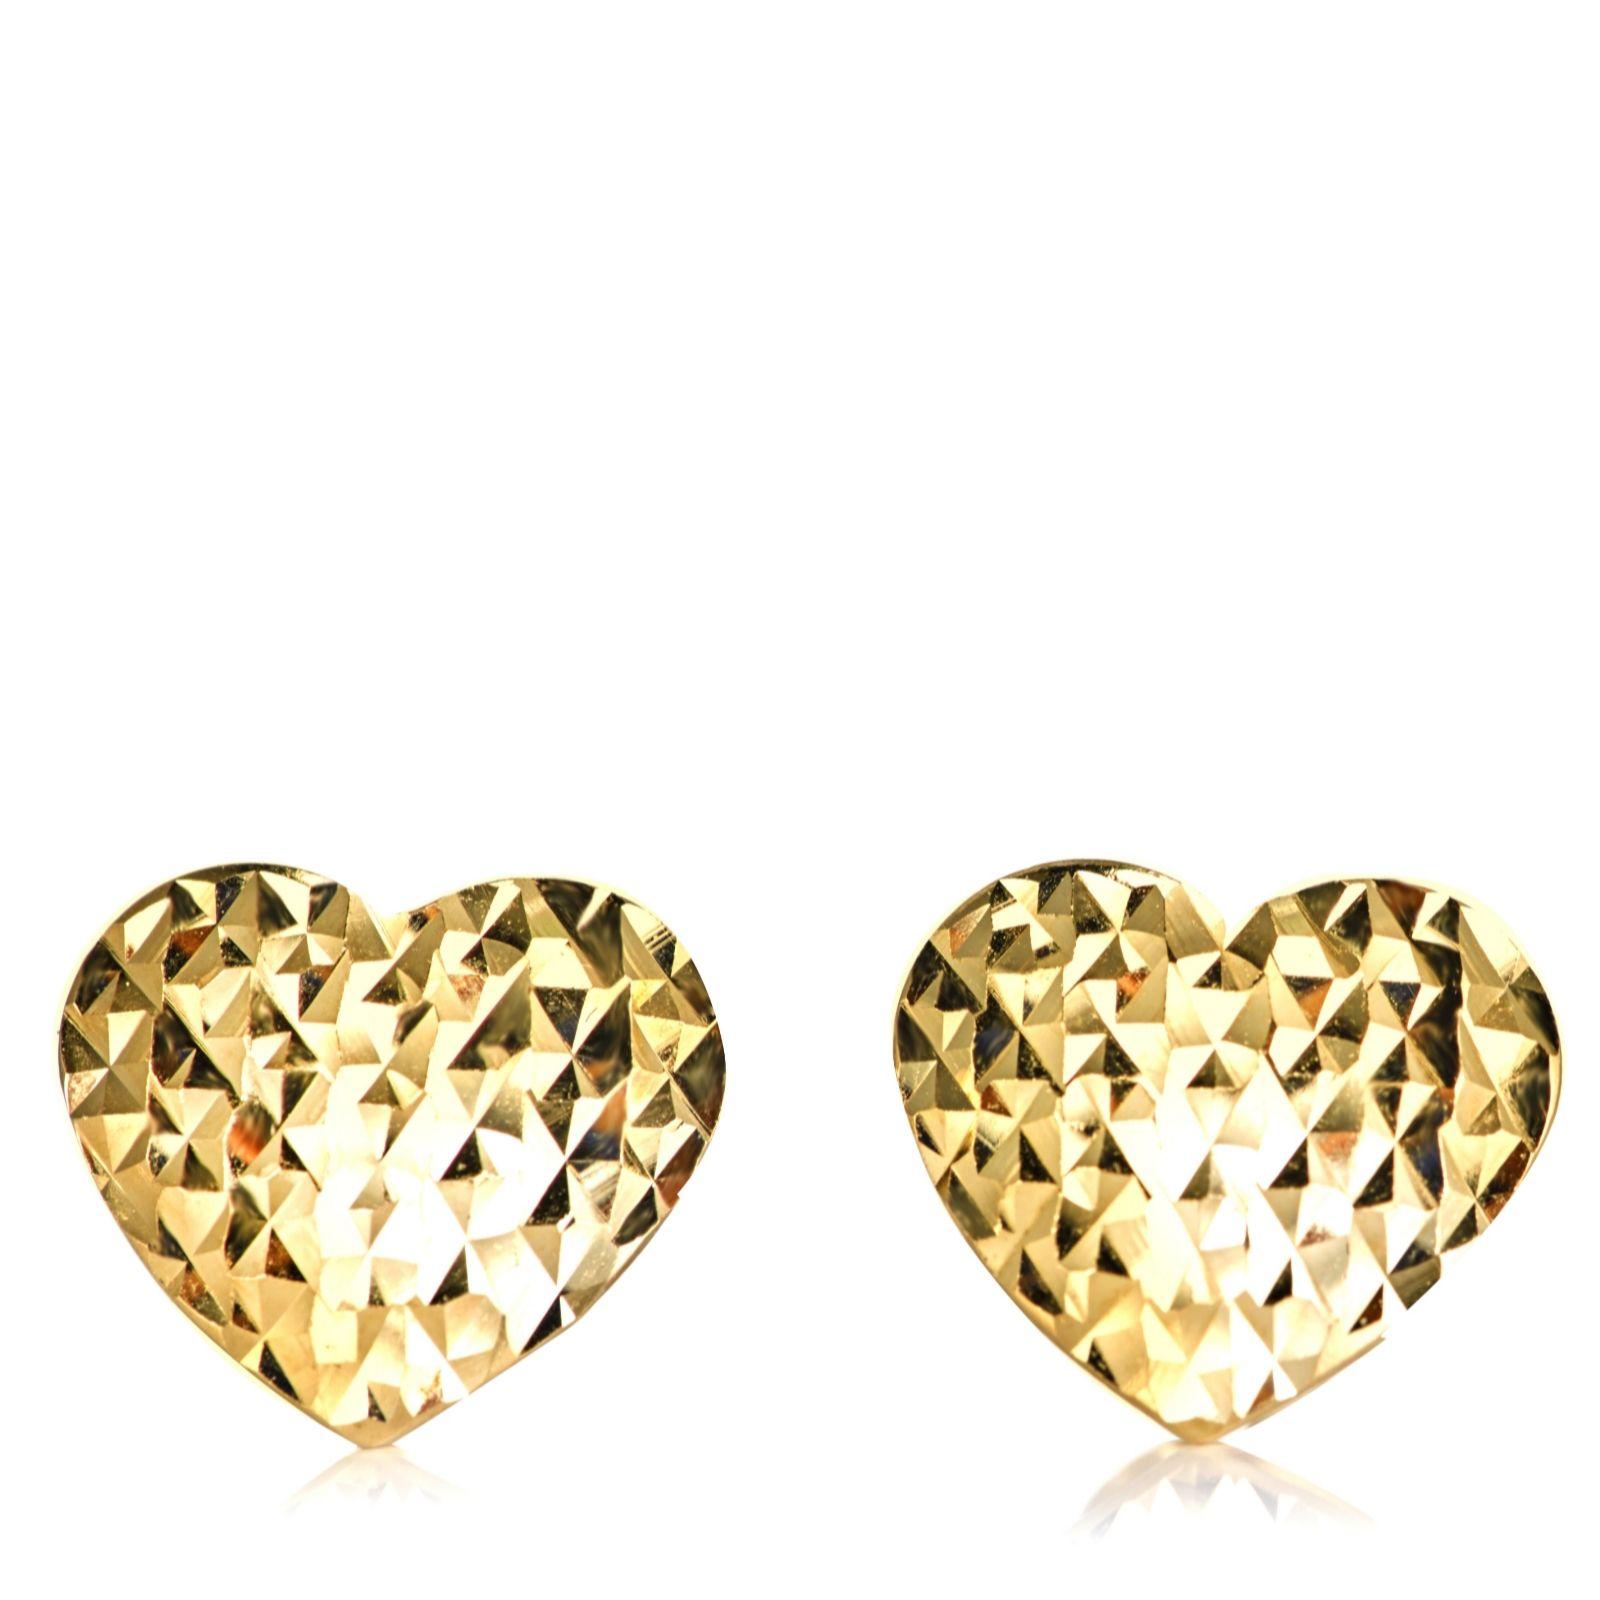 6fc1adb50 9ct Gold Diamond Cut Heart Stud Earrings - QVC UK